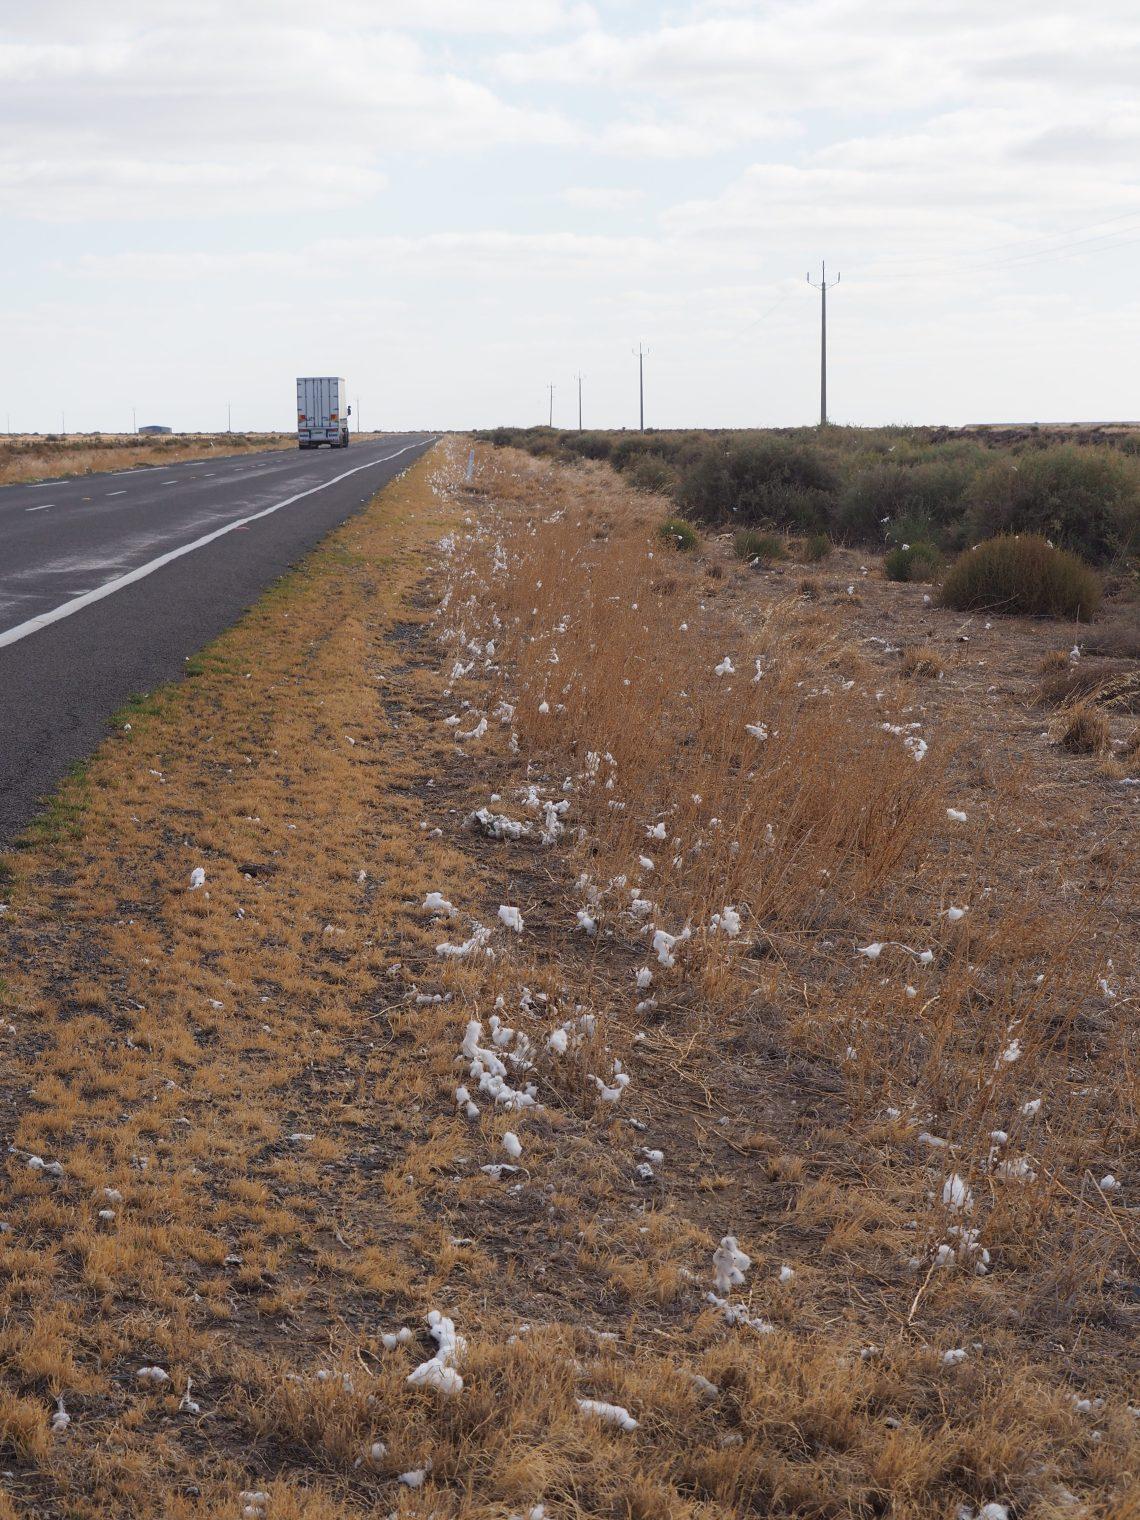 Cotton balls line the road